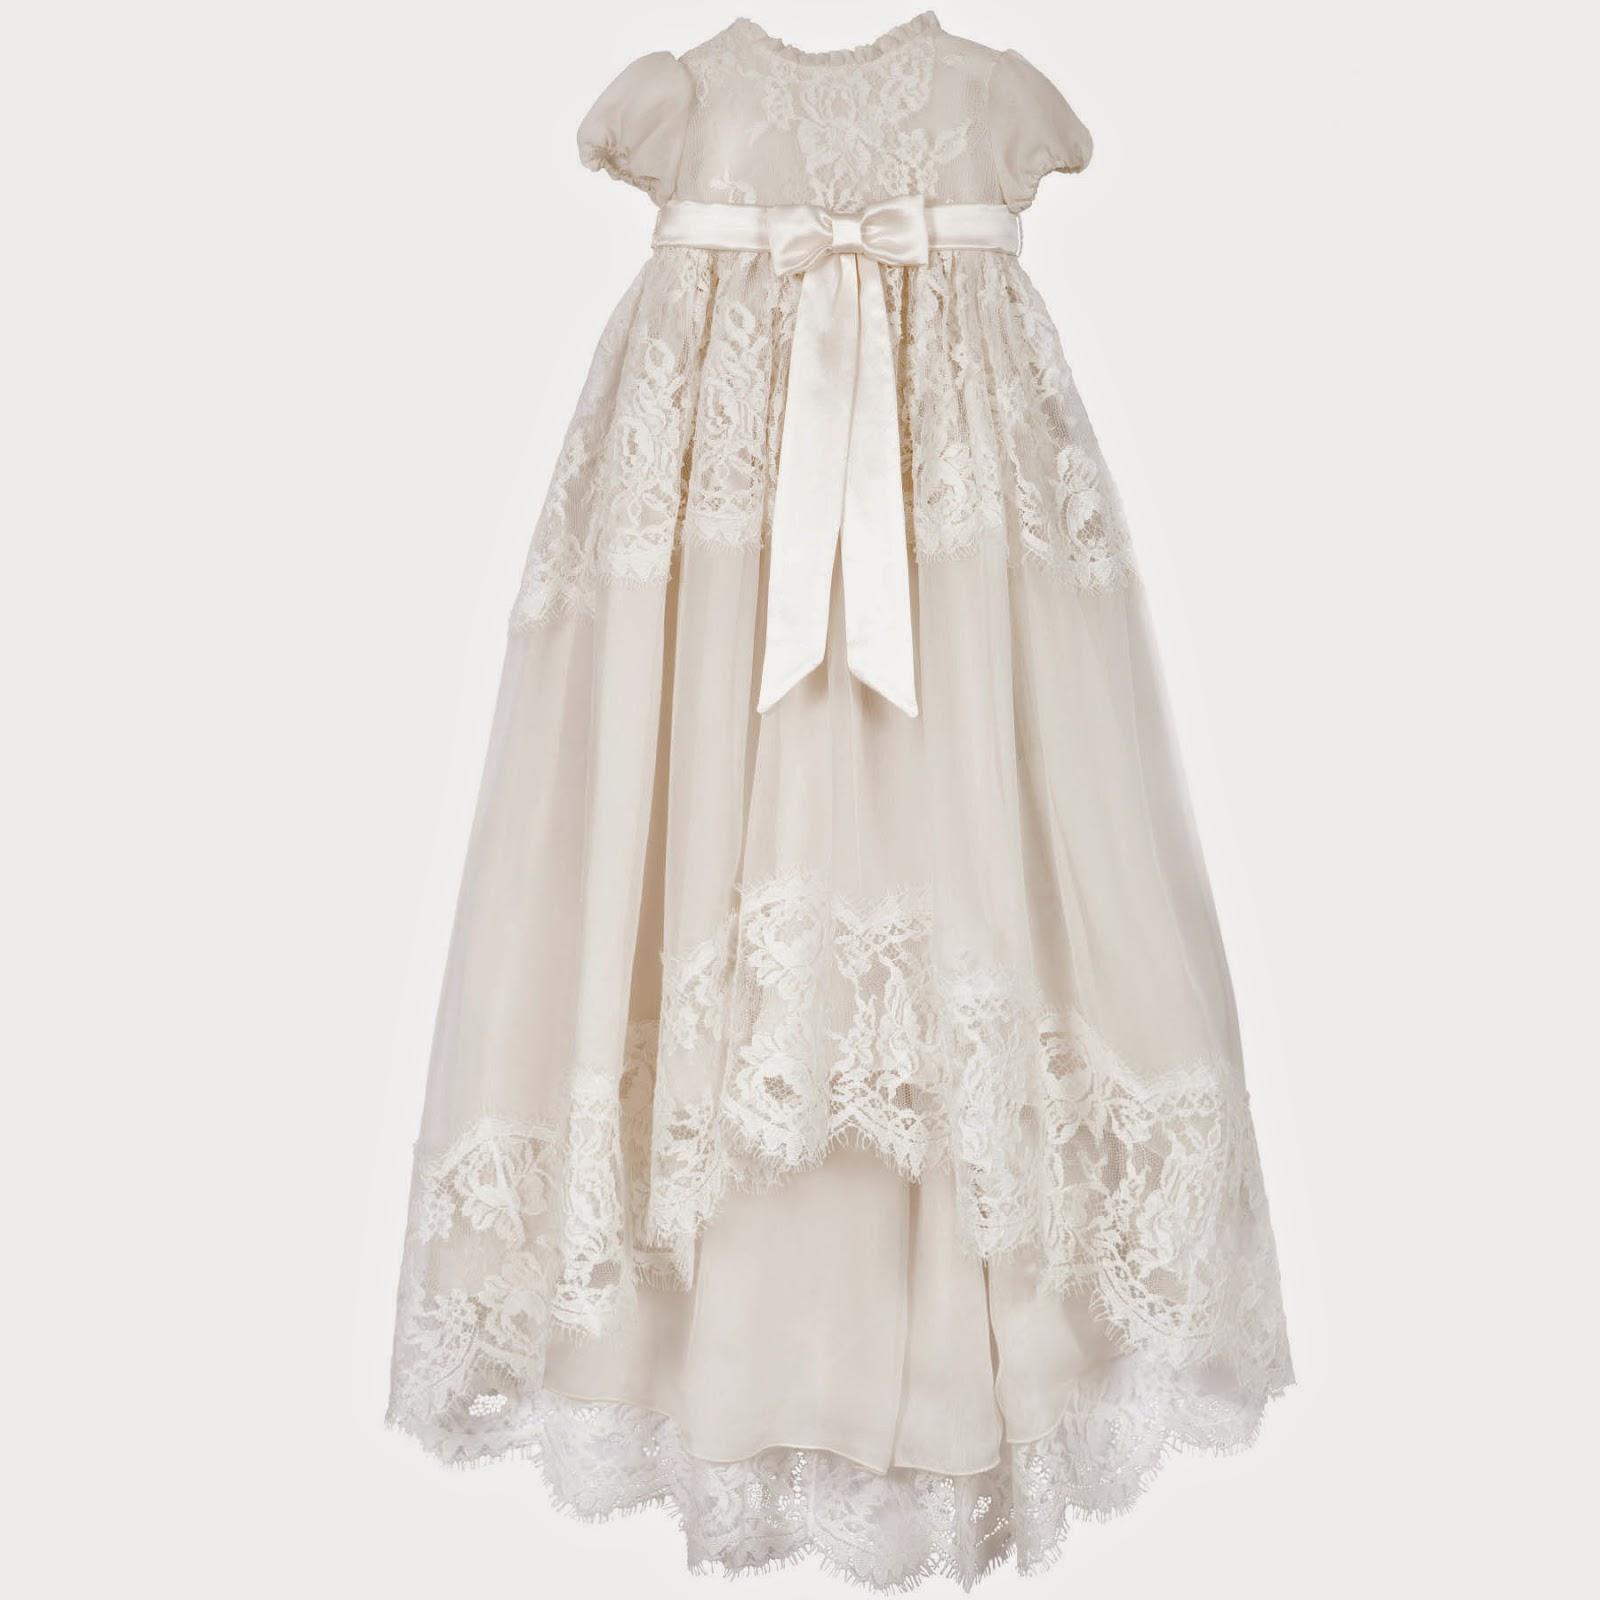 Dolce & Gabanna Christening Dress